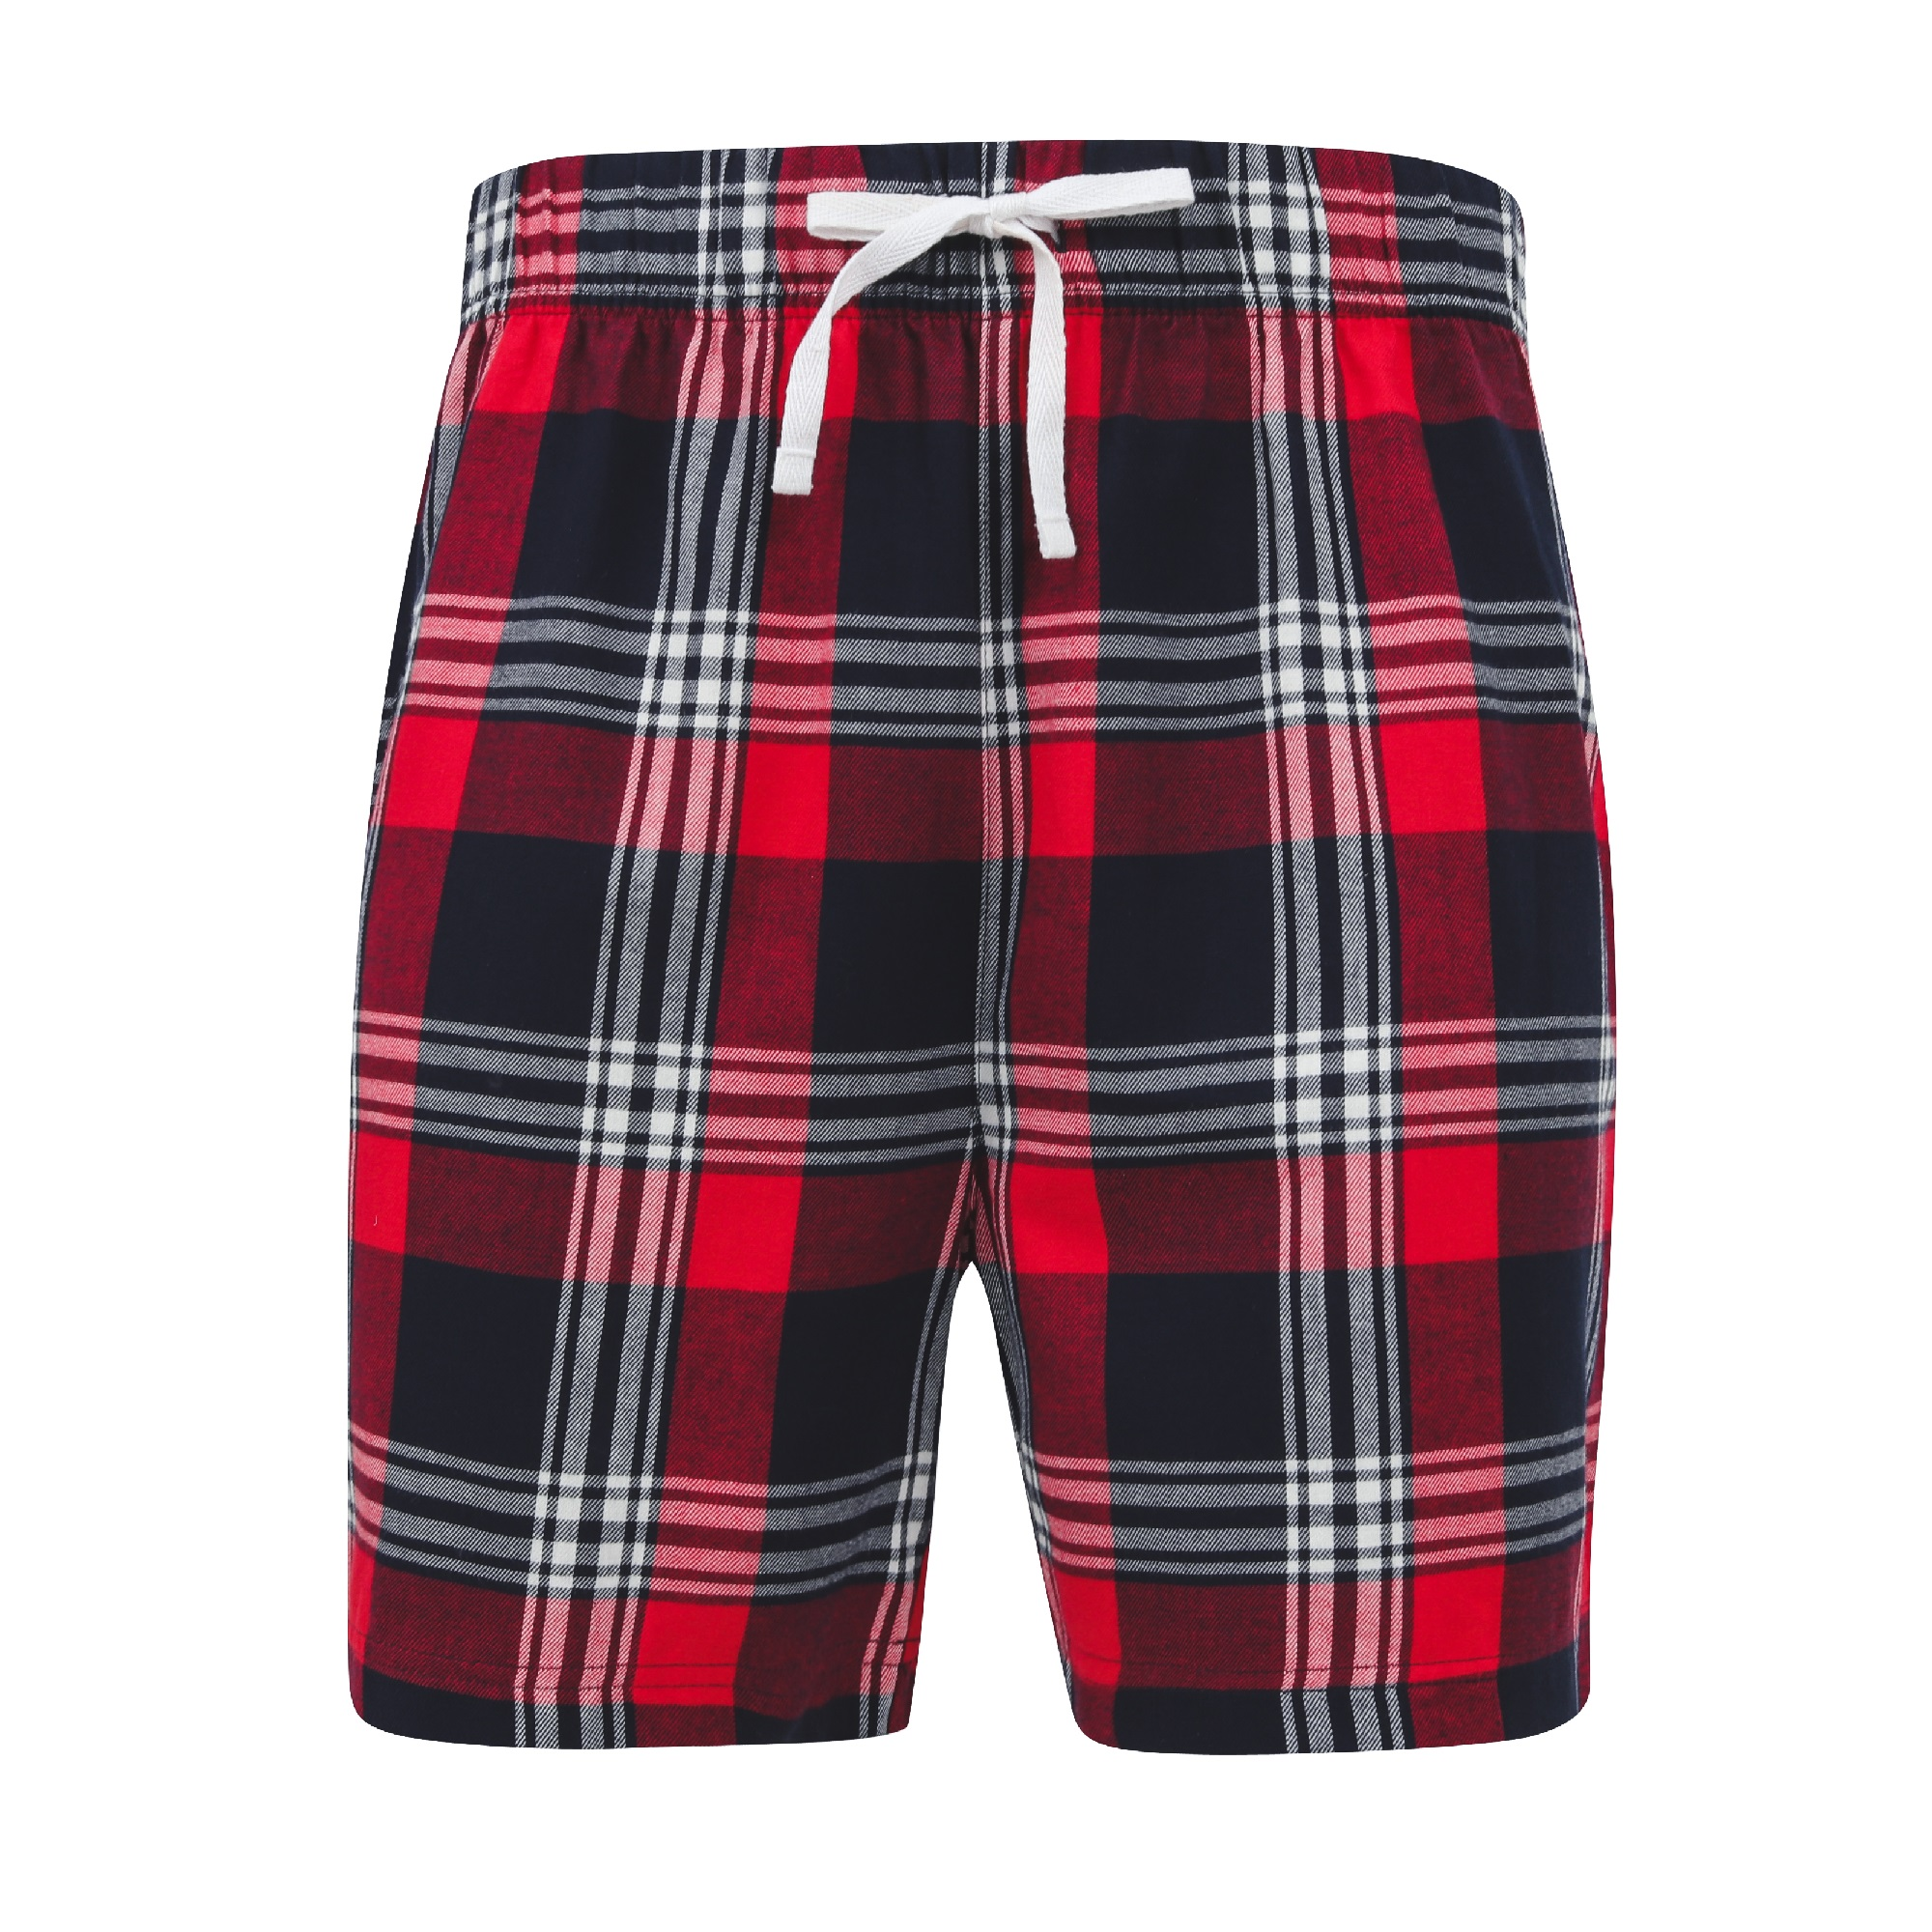 Skinni Fit Mens Tartan Lounge Shorts (S) (Red/Navy Check)